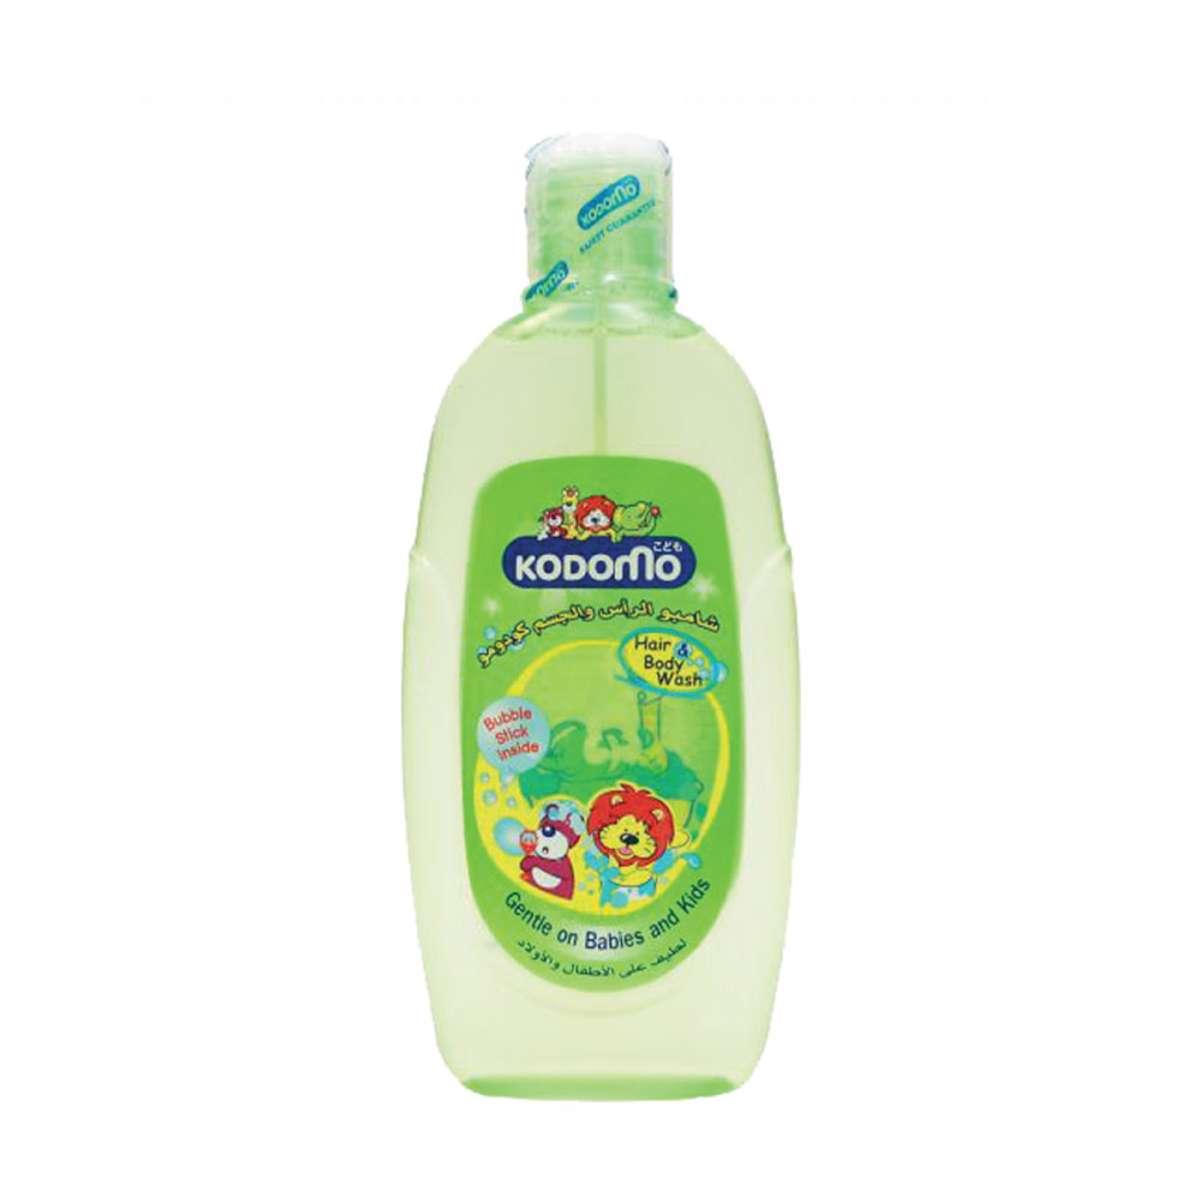 KODOMO Baby Hair & Body Wash- 100 ml